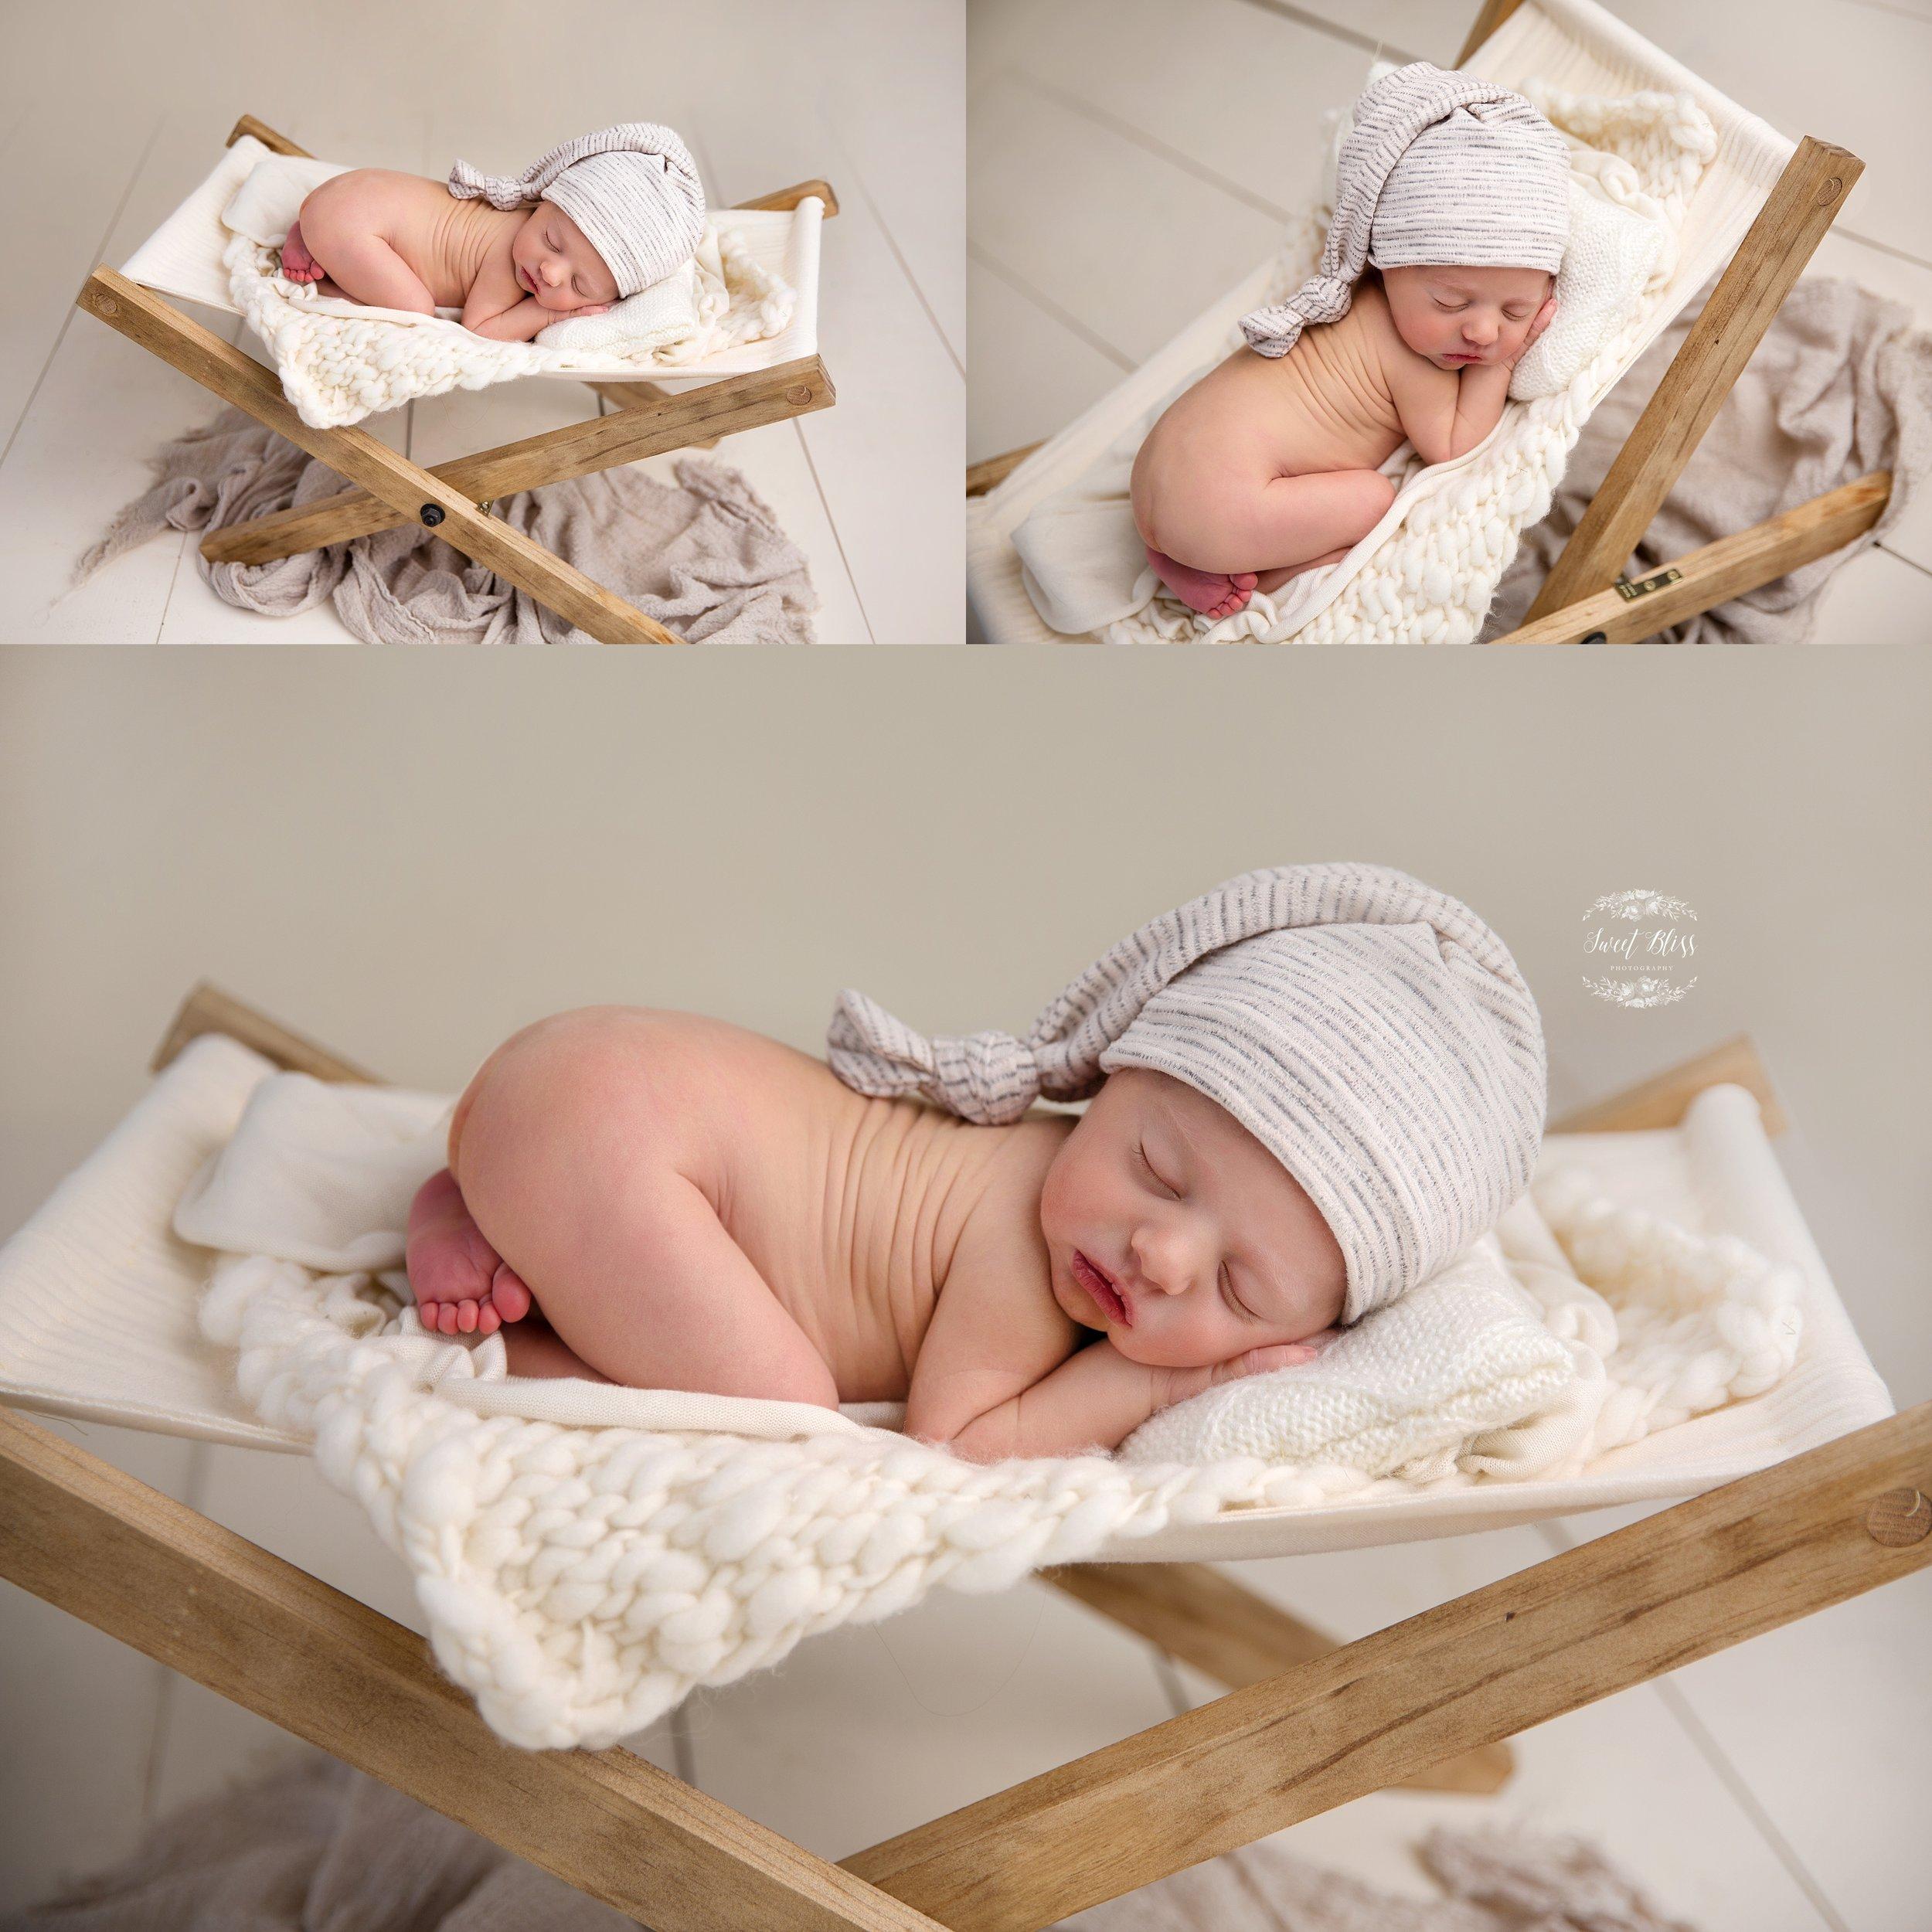 sweetblissphotography_newbornbaltimore_hammock1.jpg